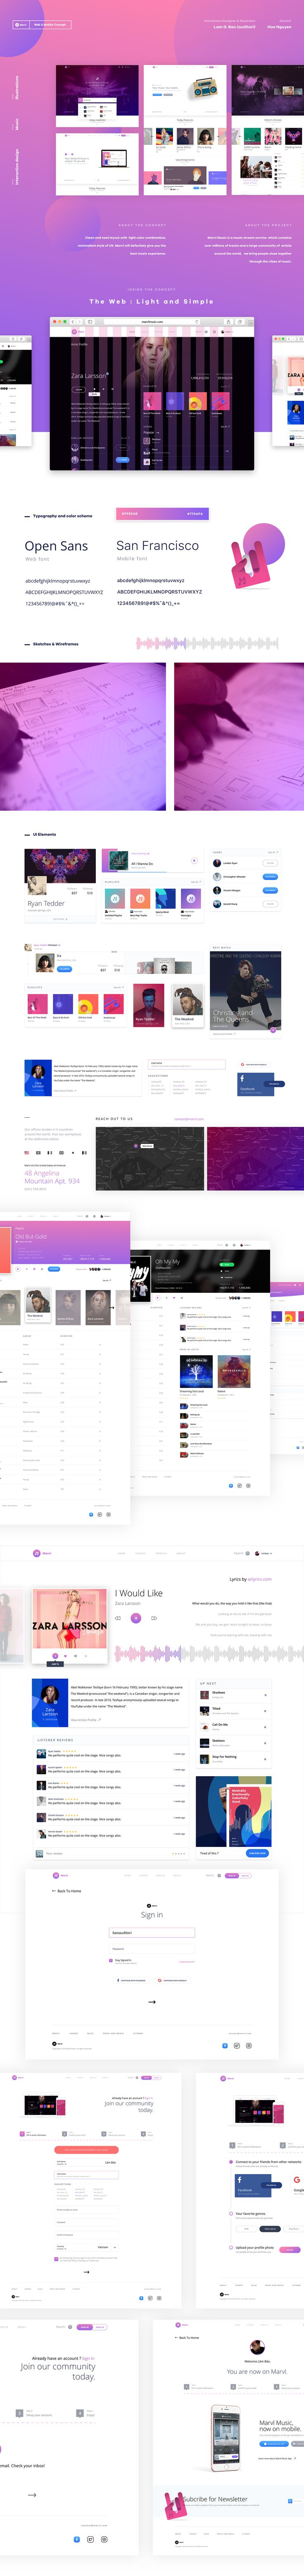 Marvl Music : Experience on Behance